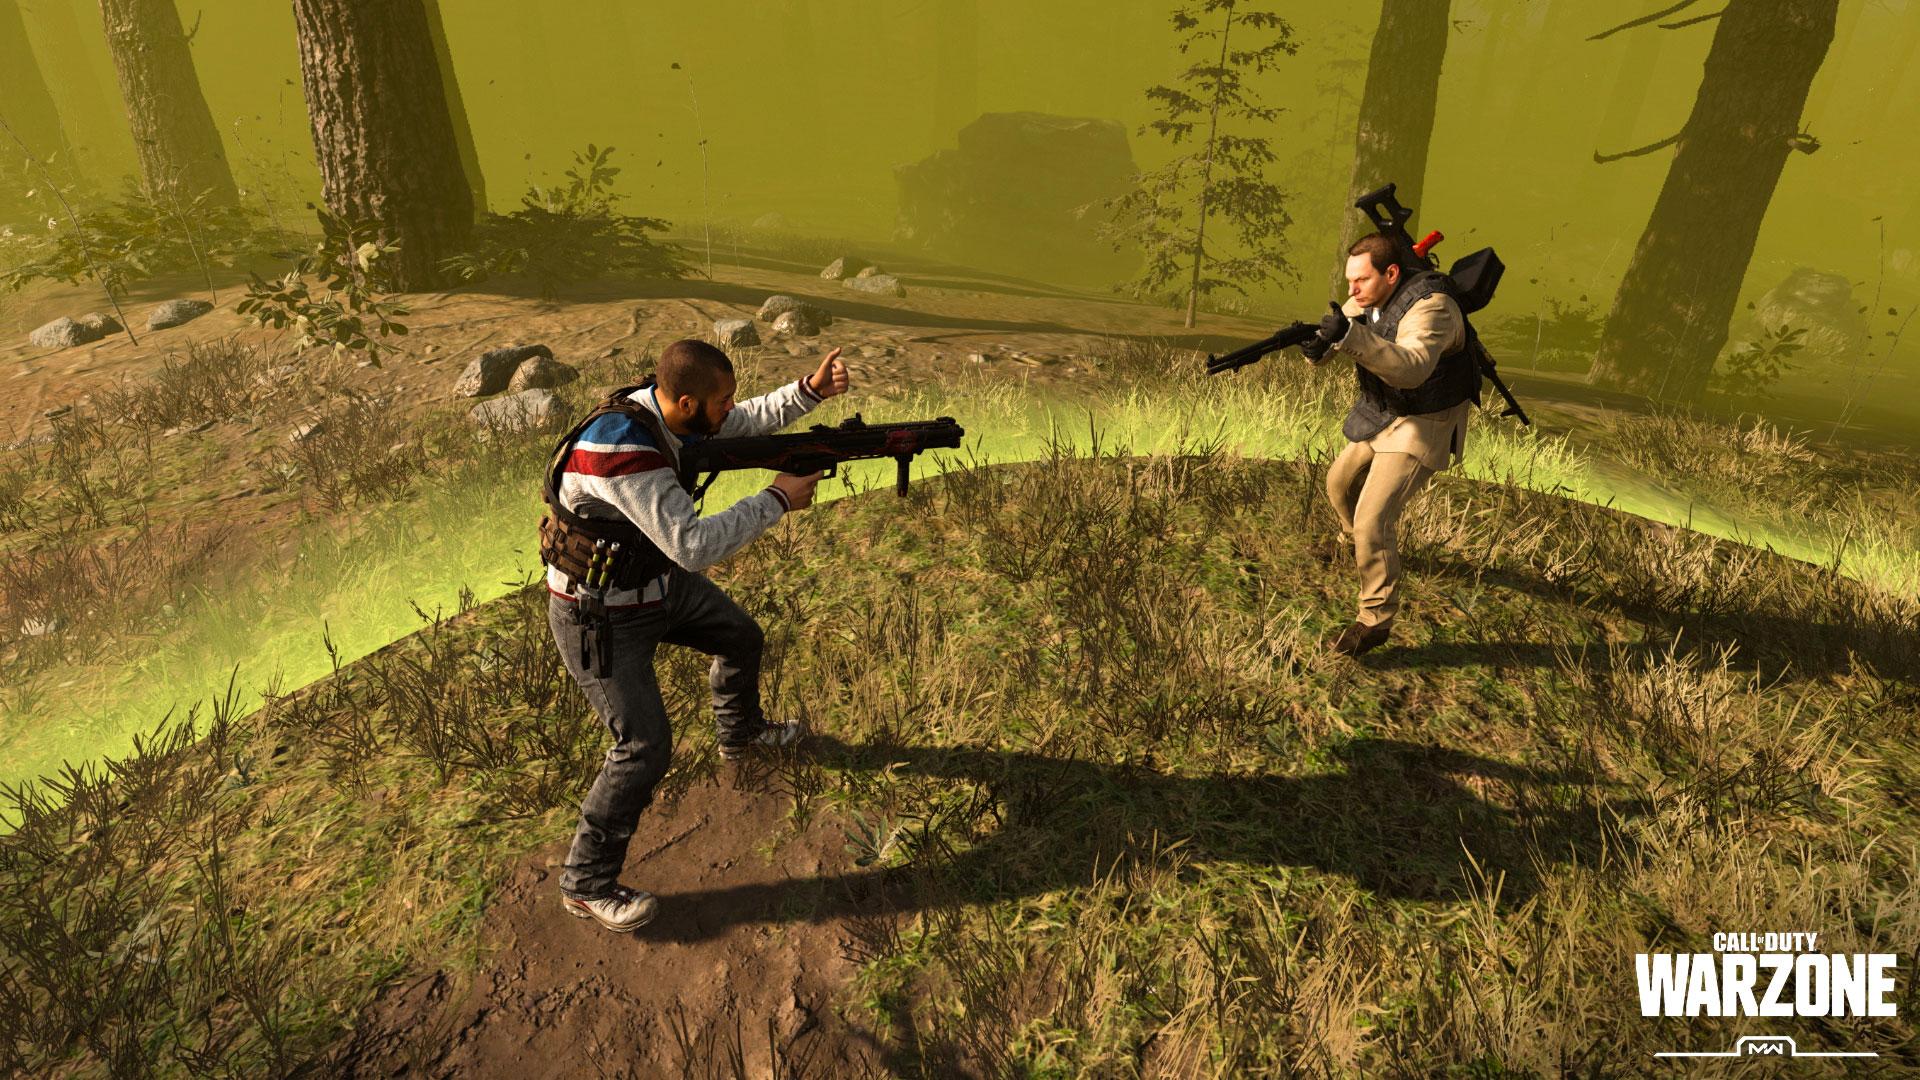 Warzone Mode Recon: Battle Royale - Image 2